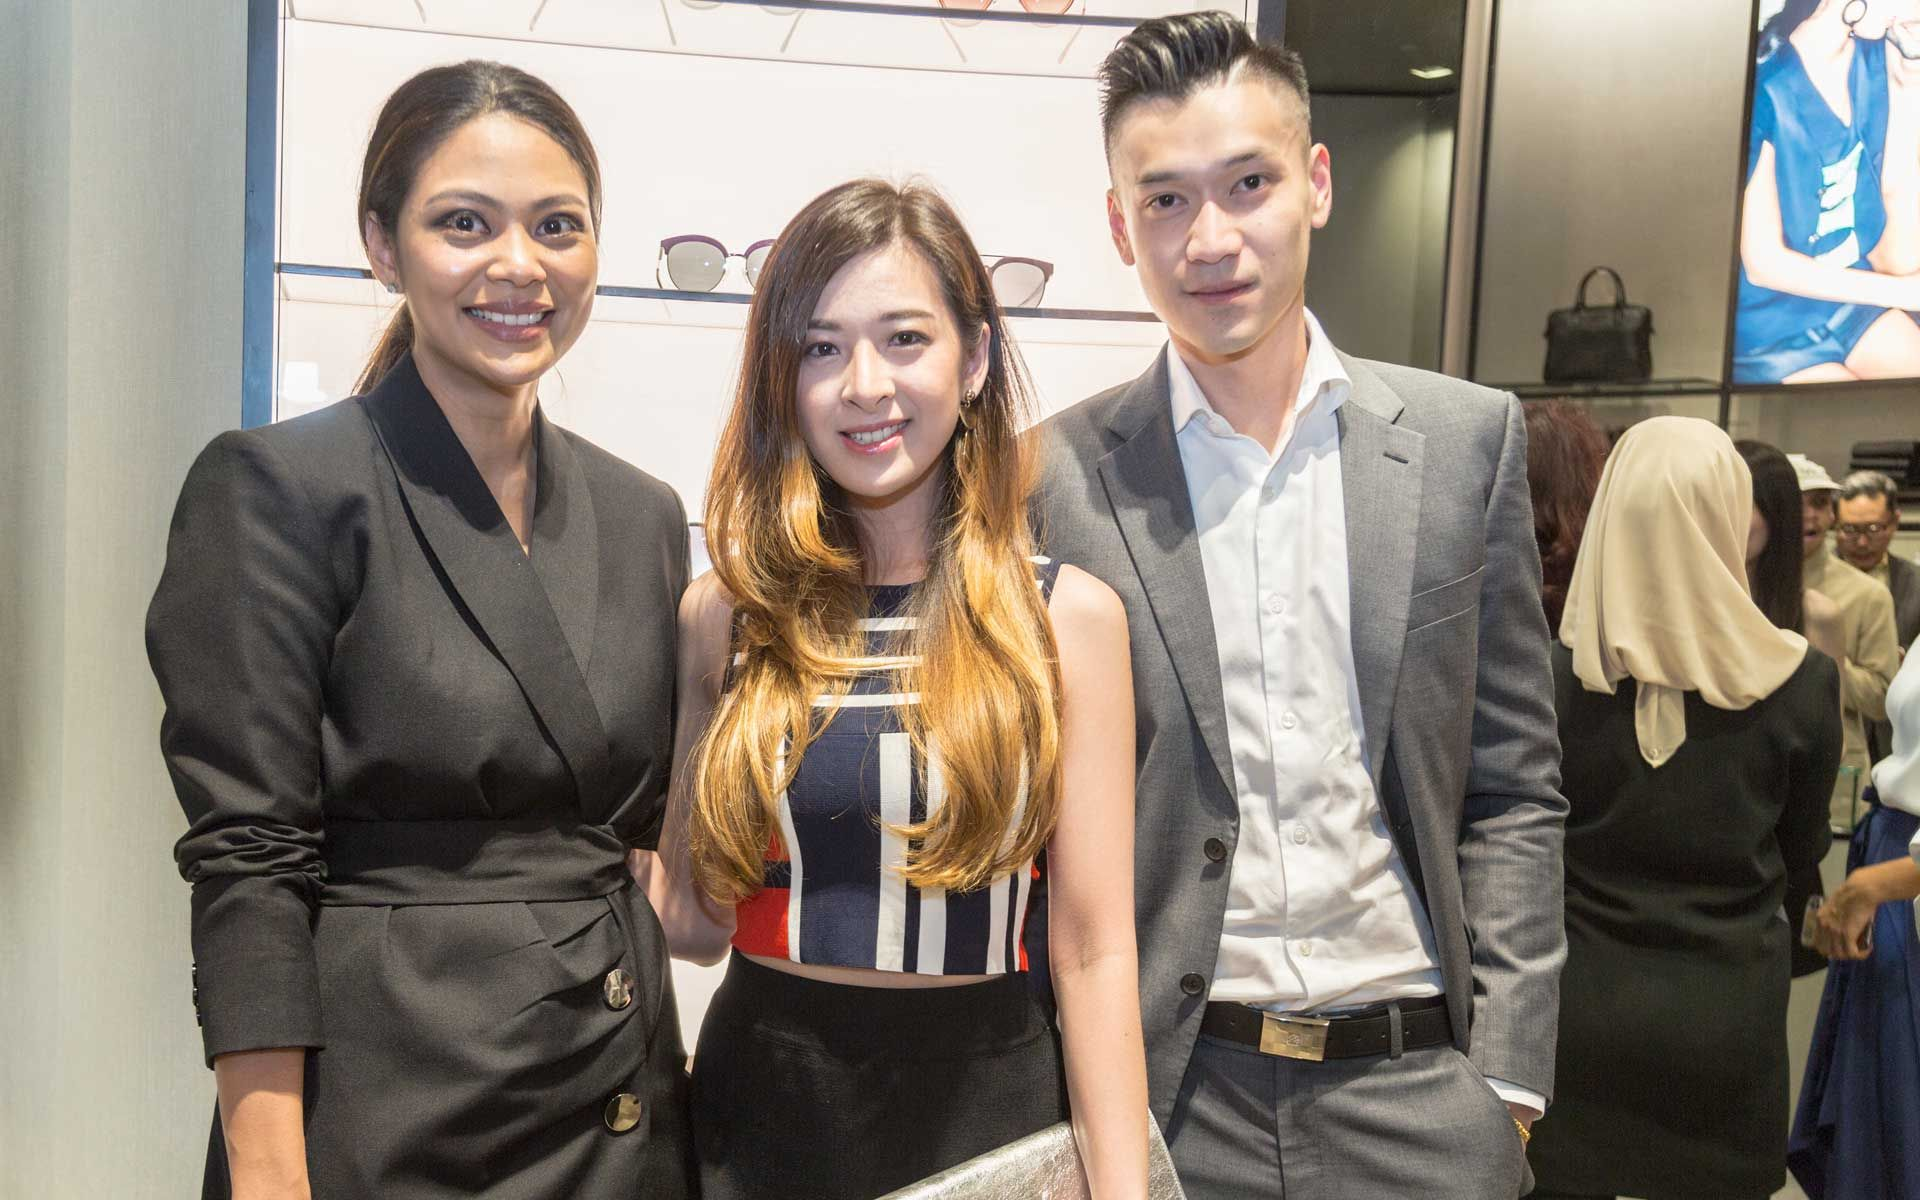 Zaireen Ibrahim, Elizabeth Thea and Jannio Shun